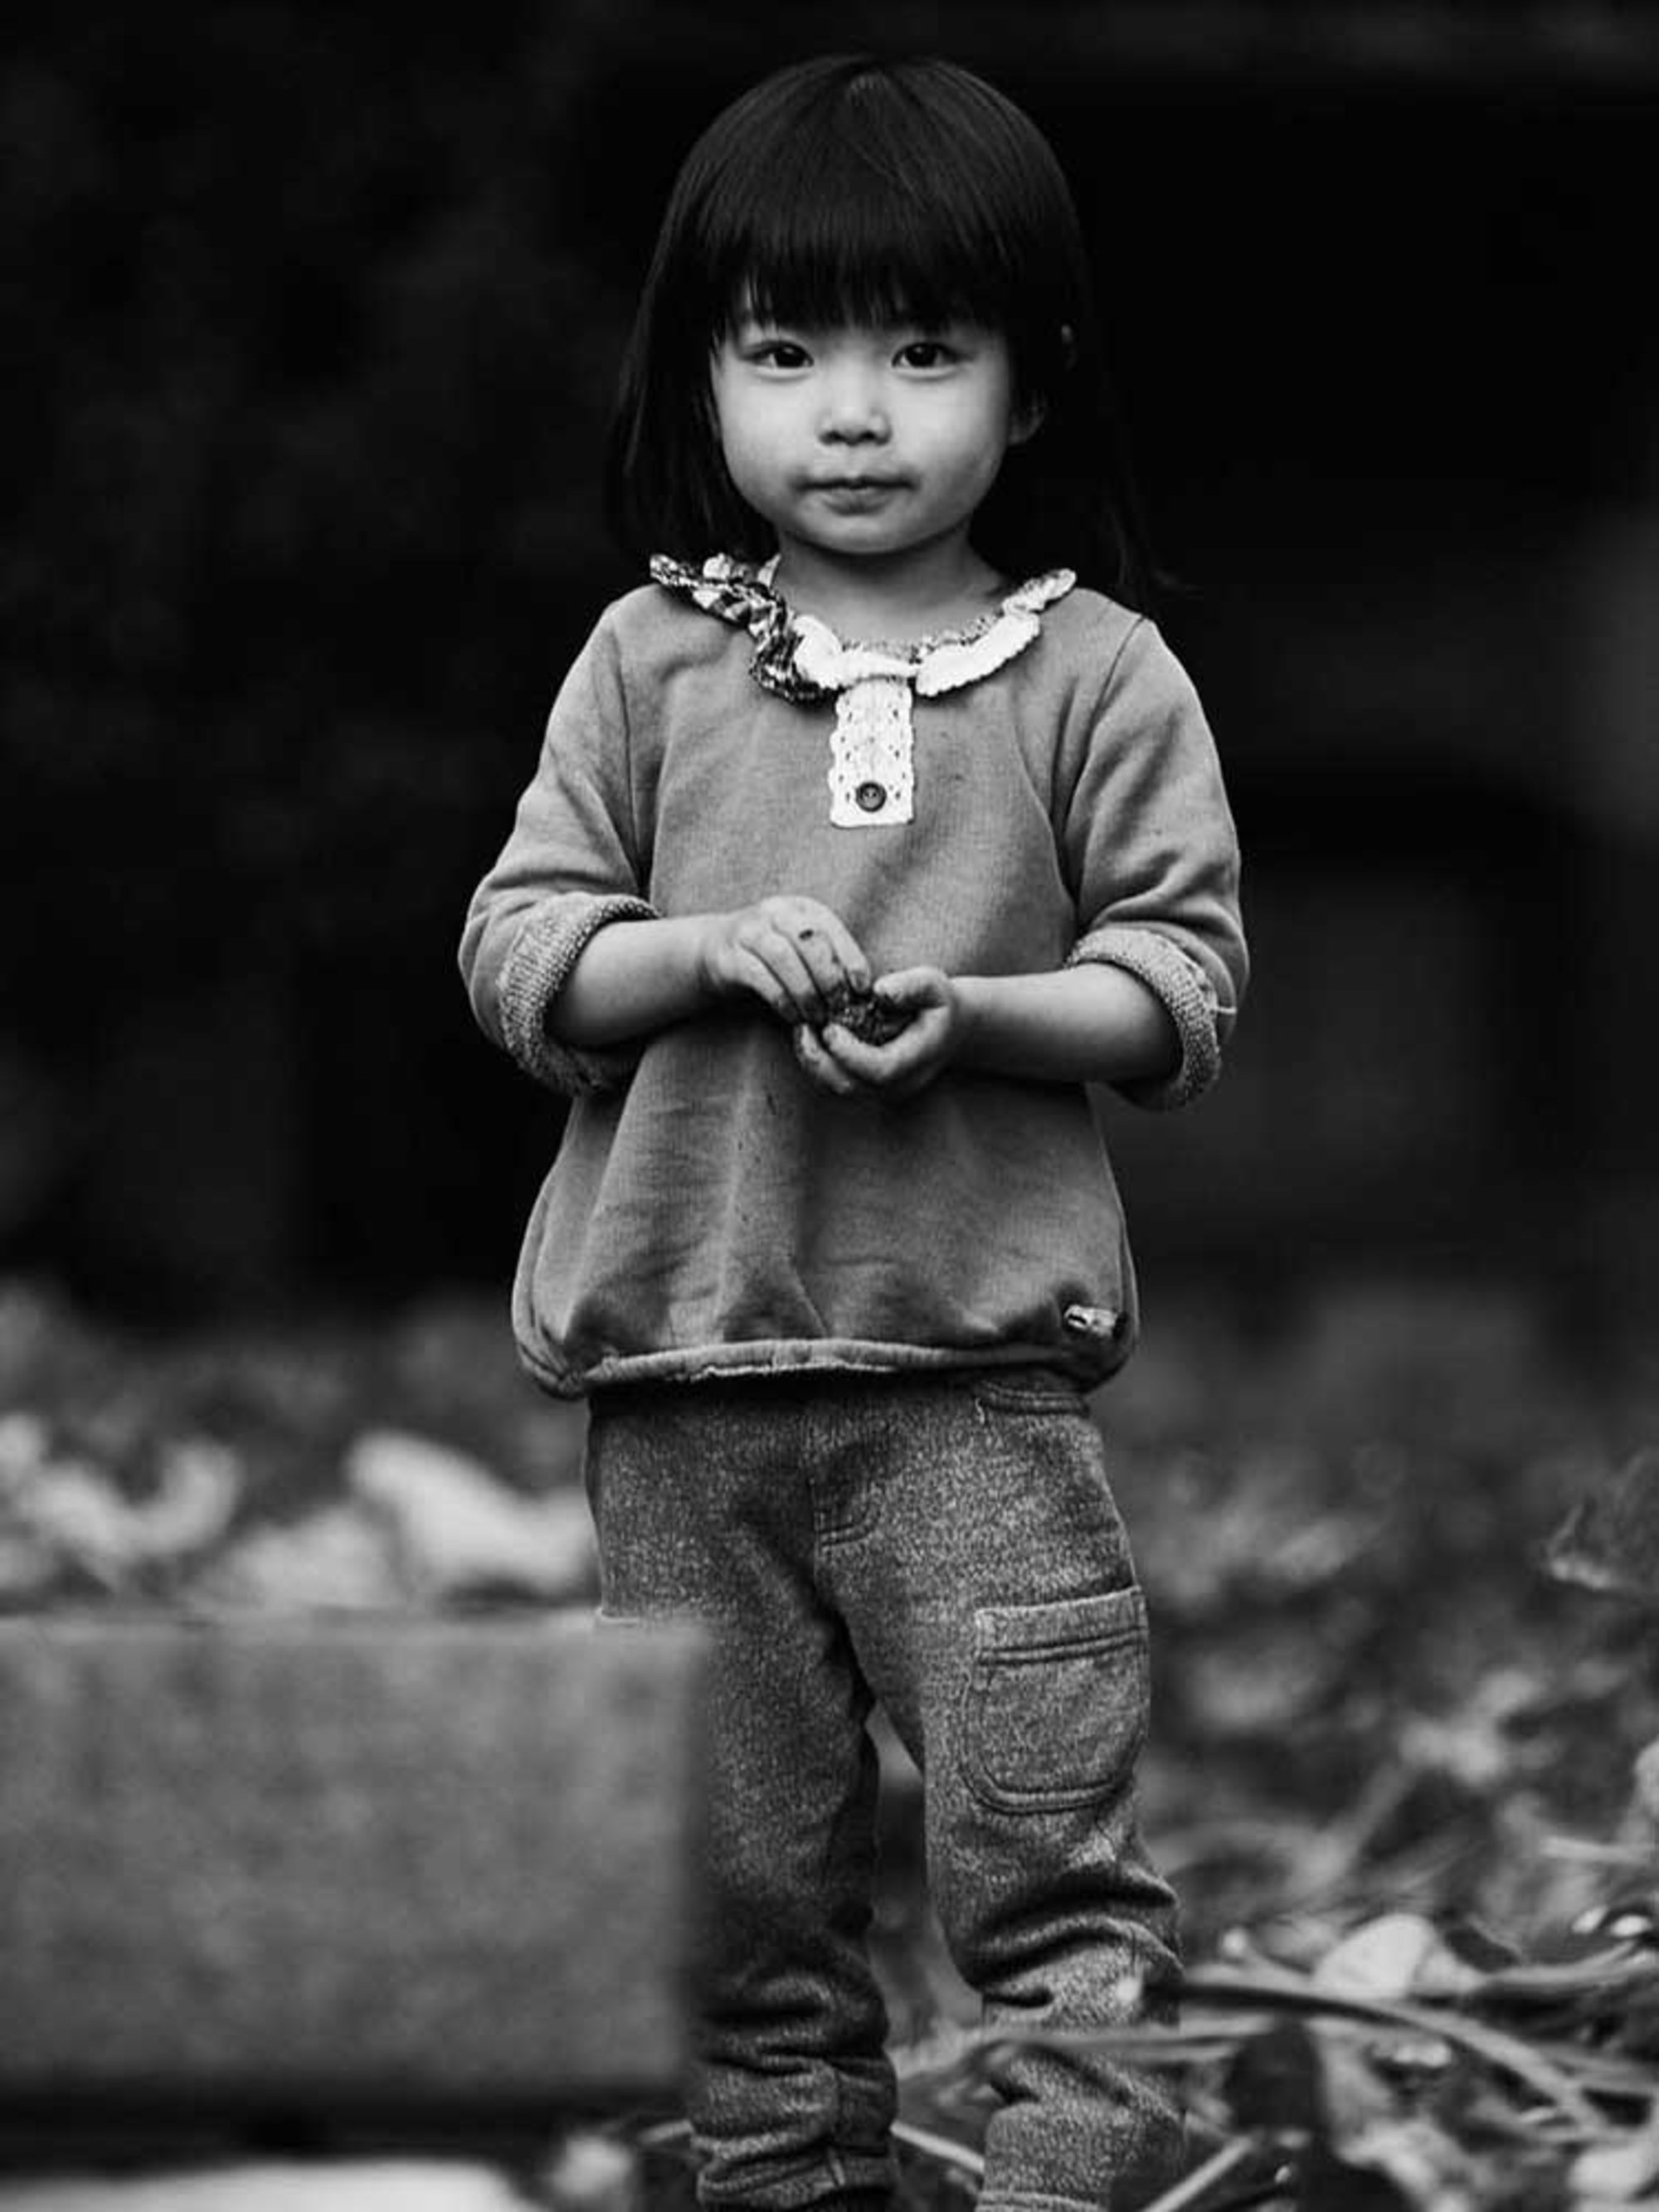 kyoto_granddaughter_750x1000.jpg